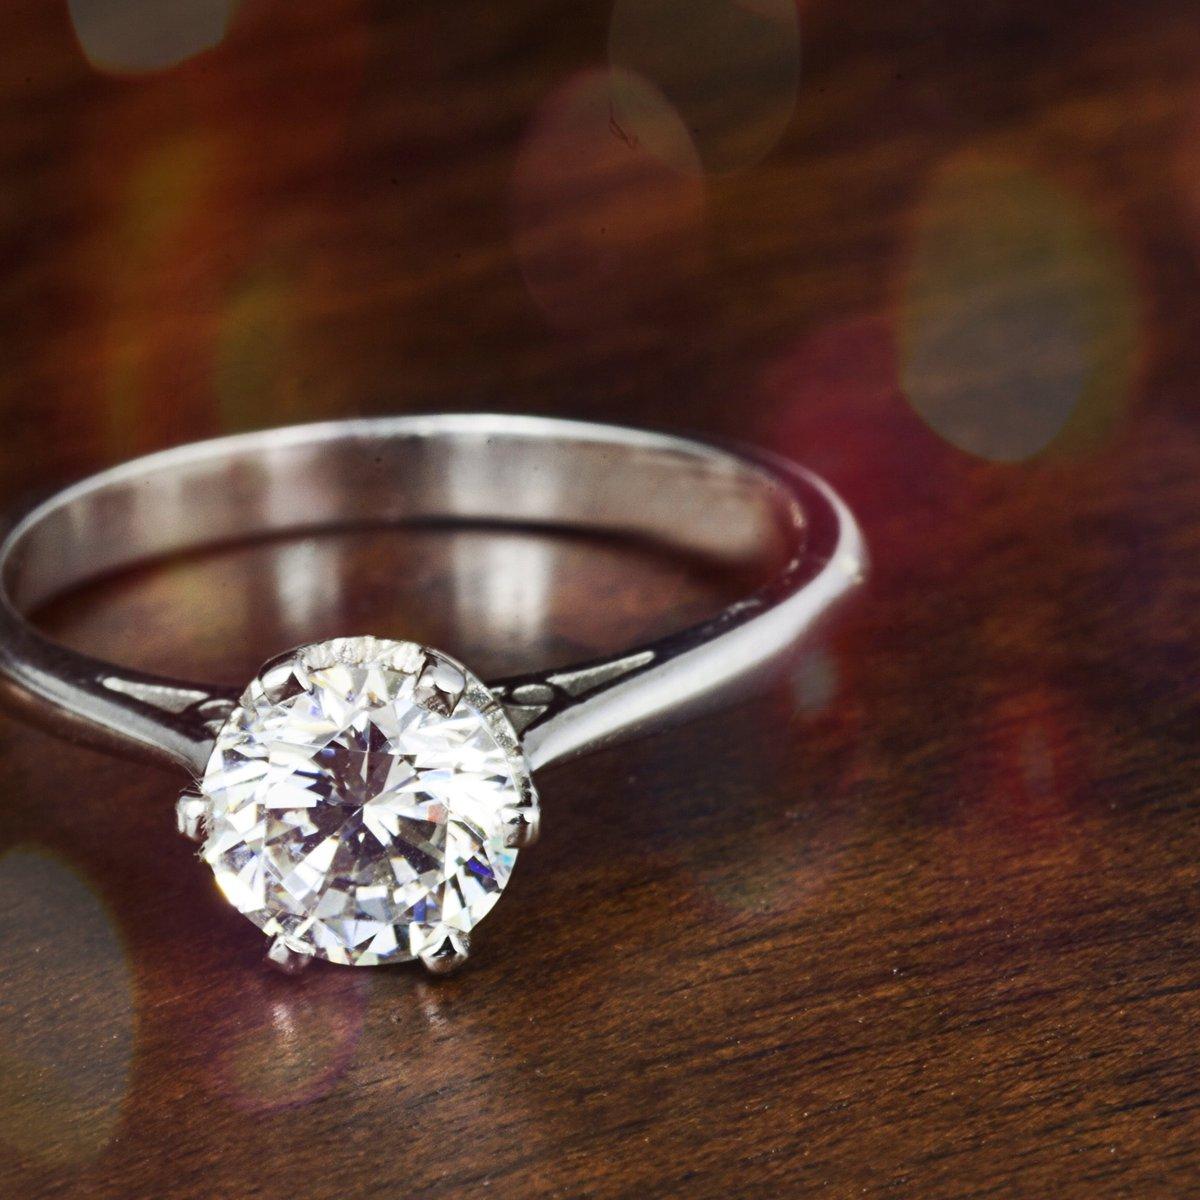 MADE Diamonds Engagement Rings #handmade #engagementring #engagement #sustainable #ukvegans #uk #london #birmingham #ethical #ecofashion<br>http://pic.twitter.com/pD0AXYn9iH